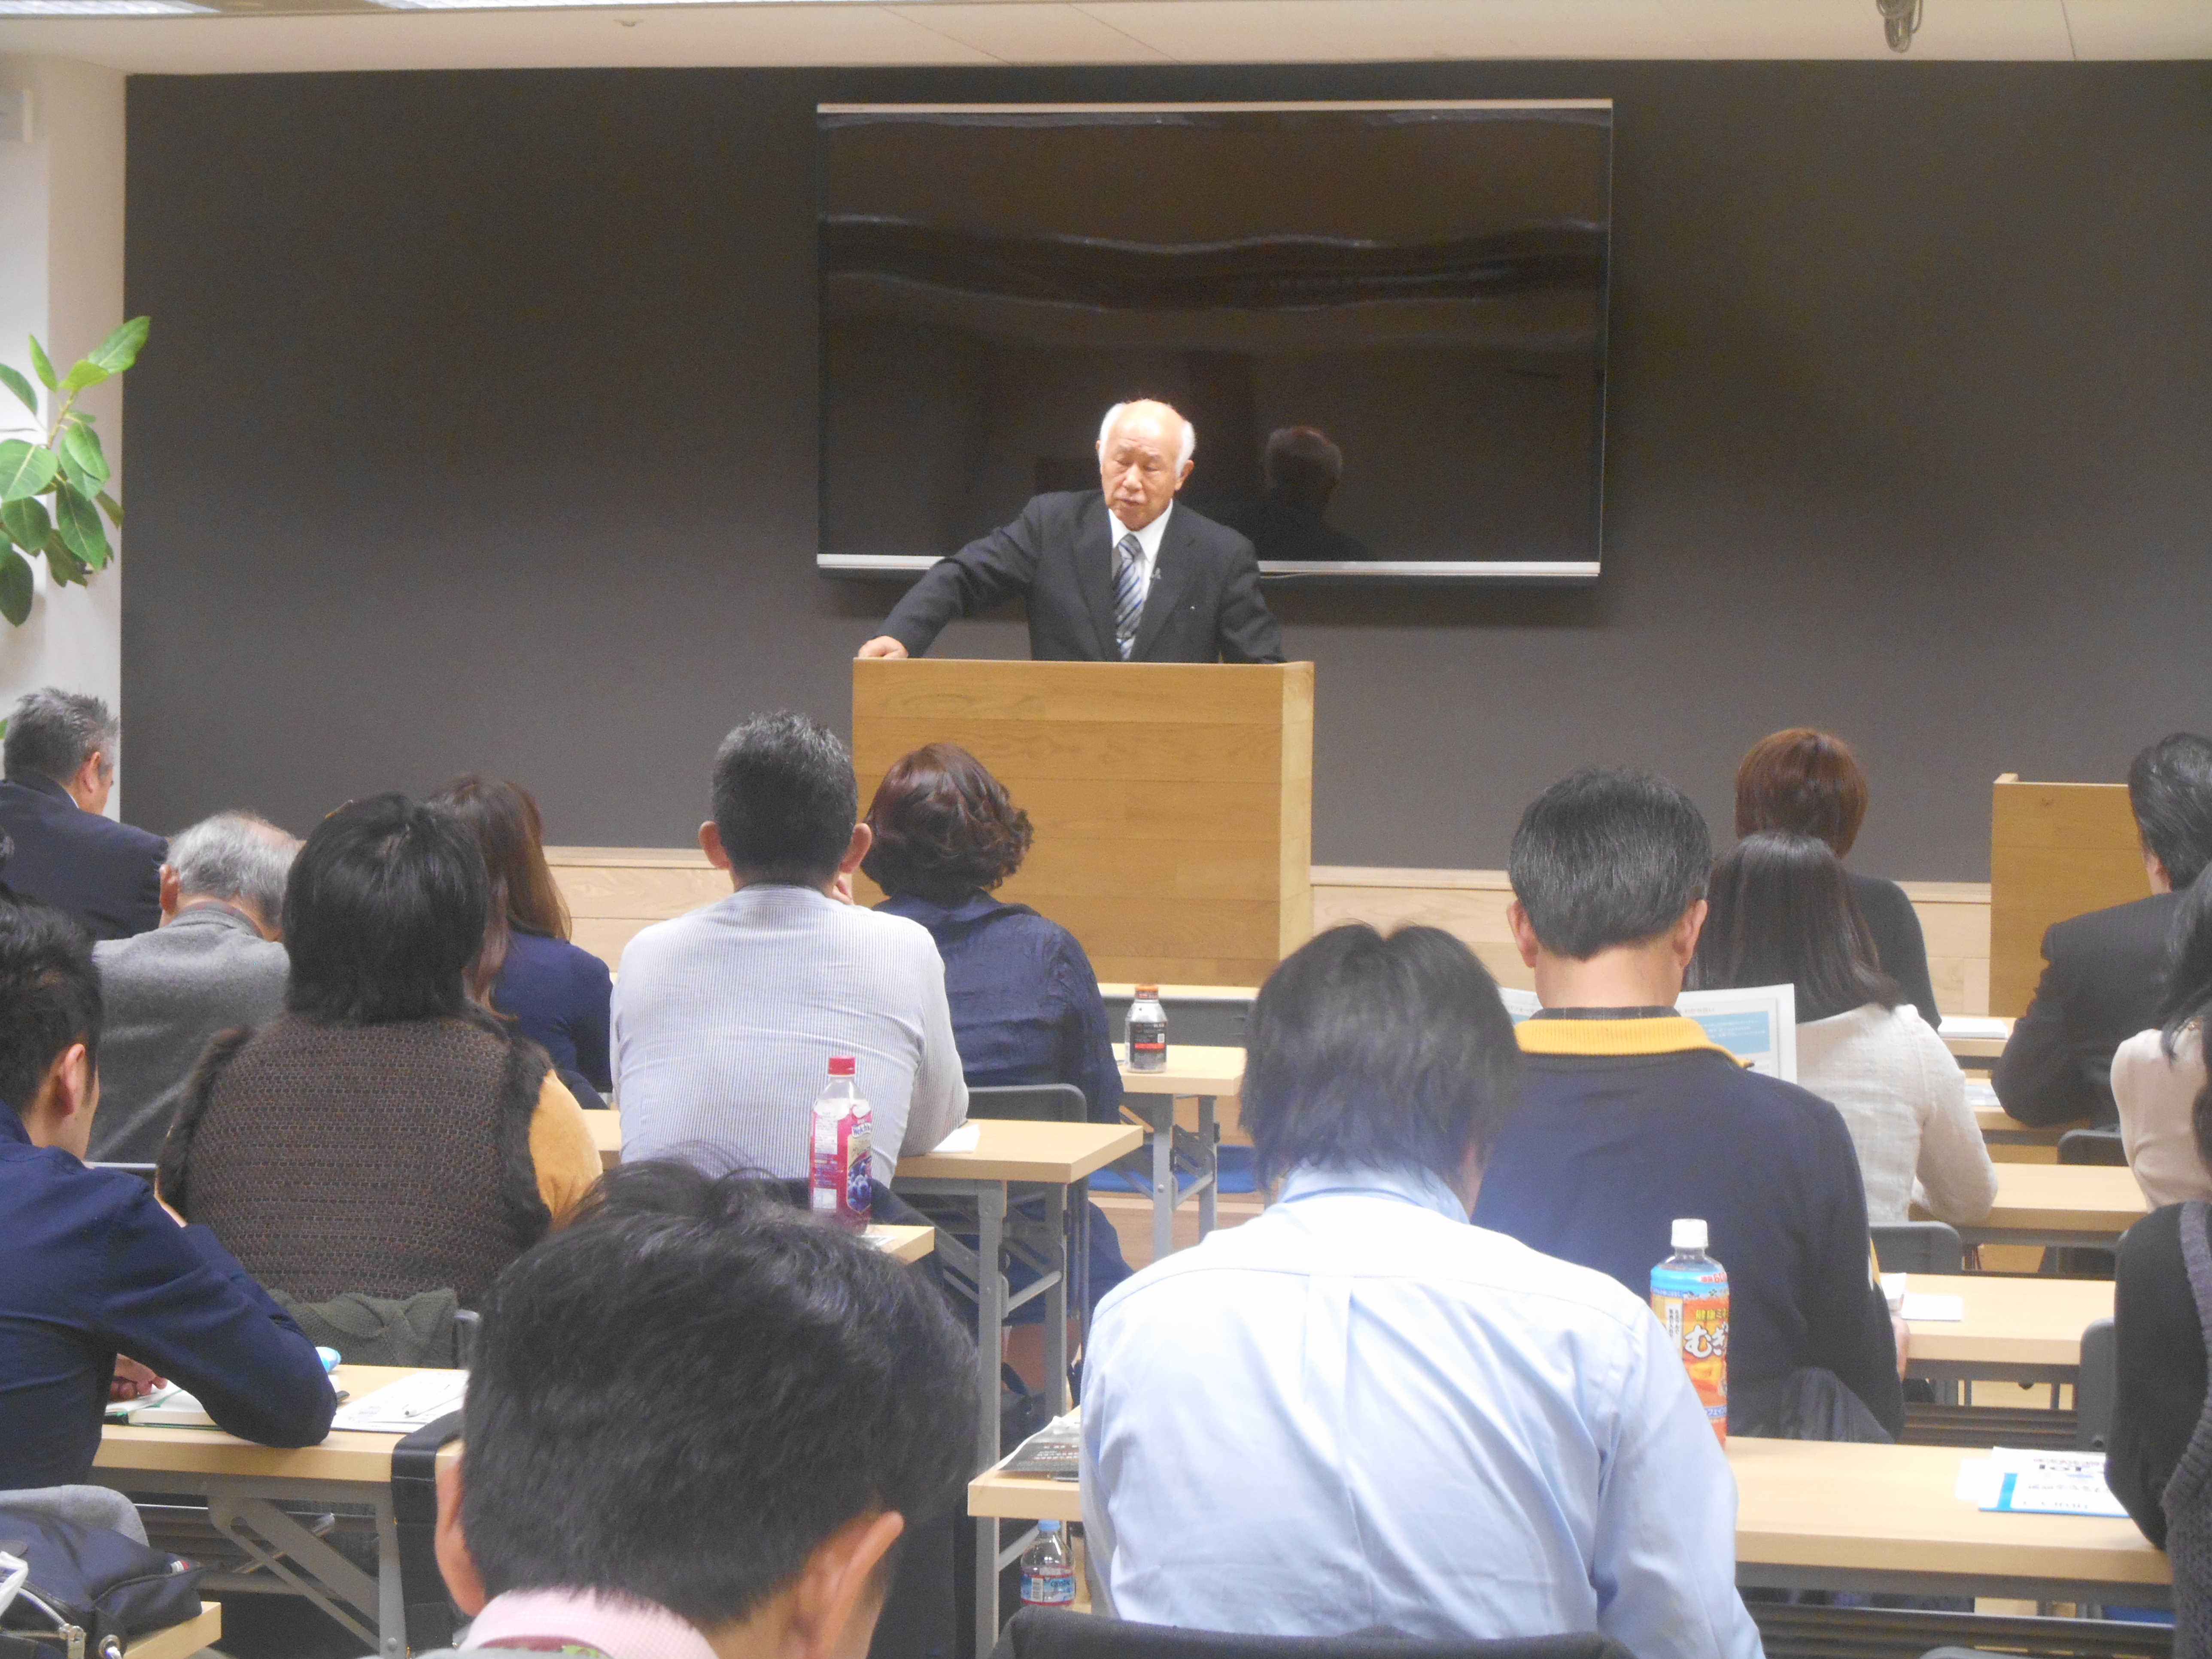 DSCN0455 - 4月1日東京思風塾の開催になります。